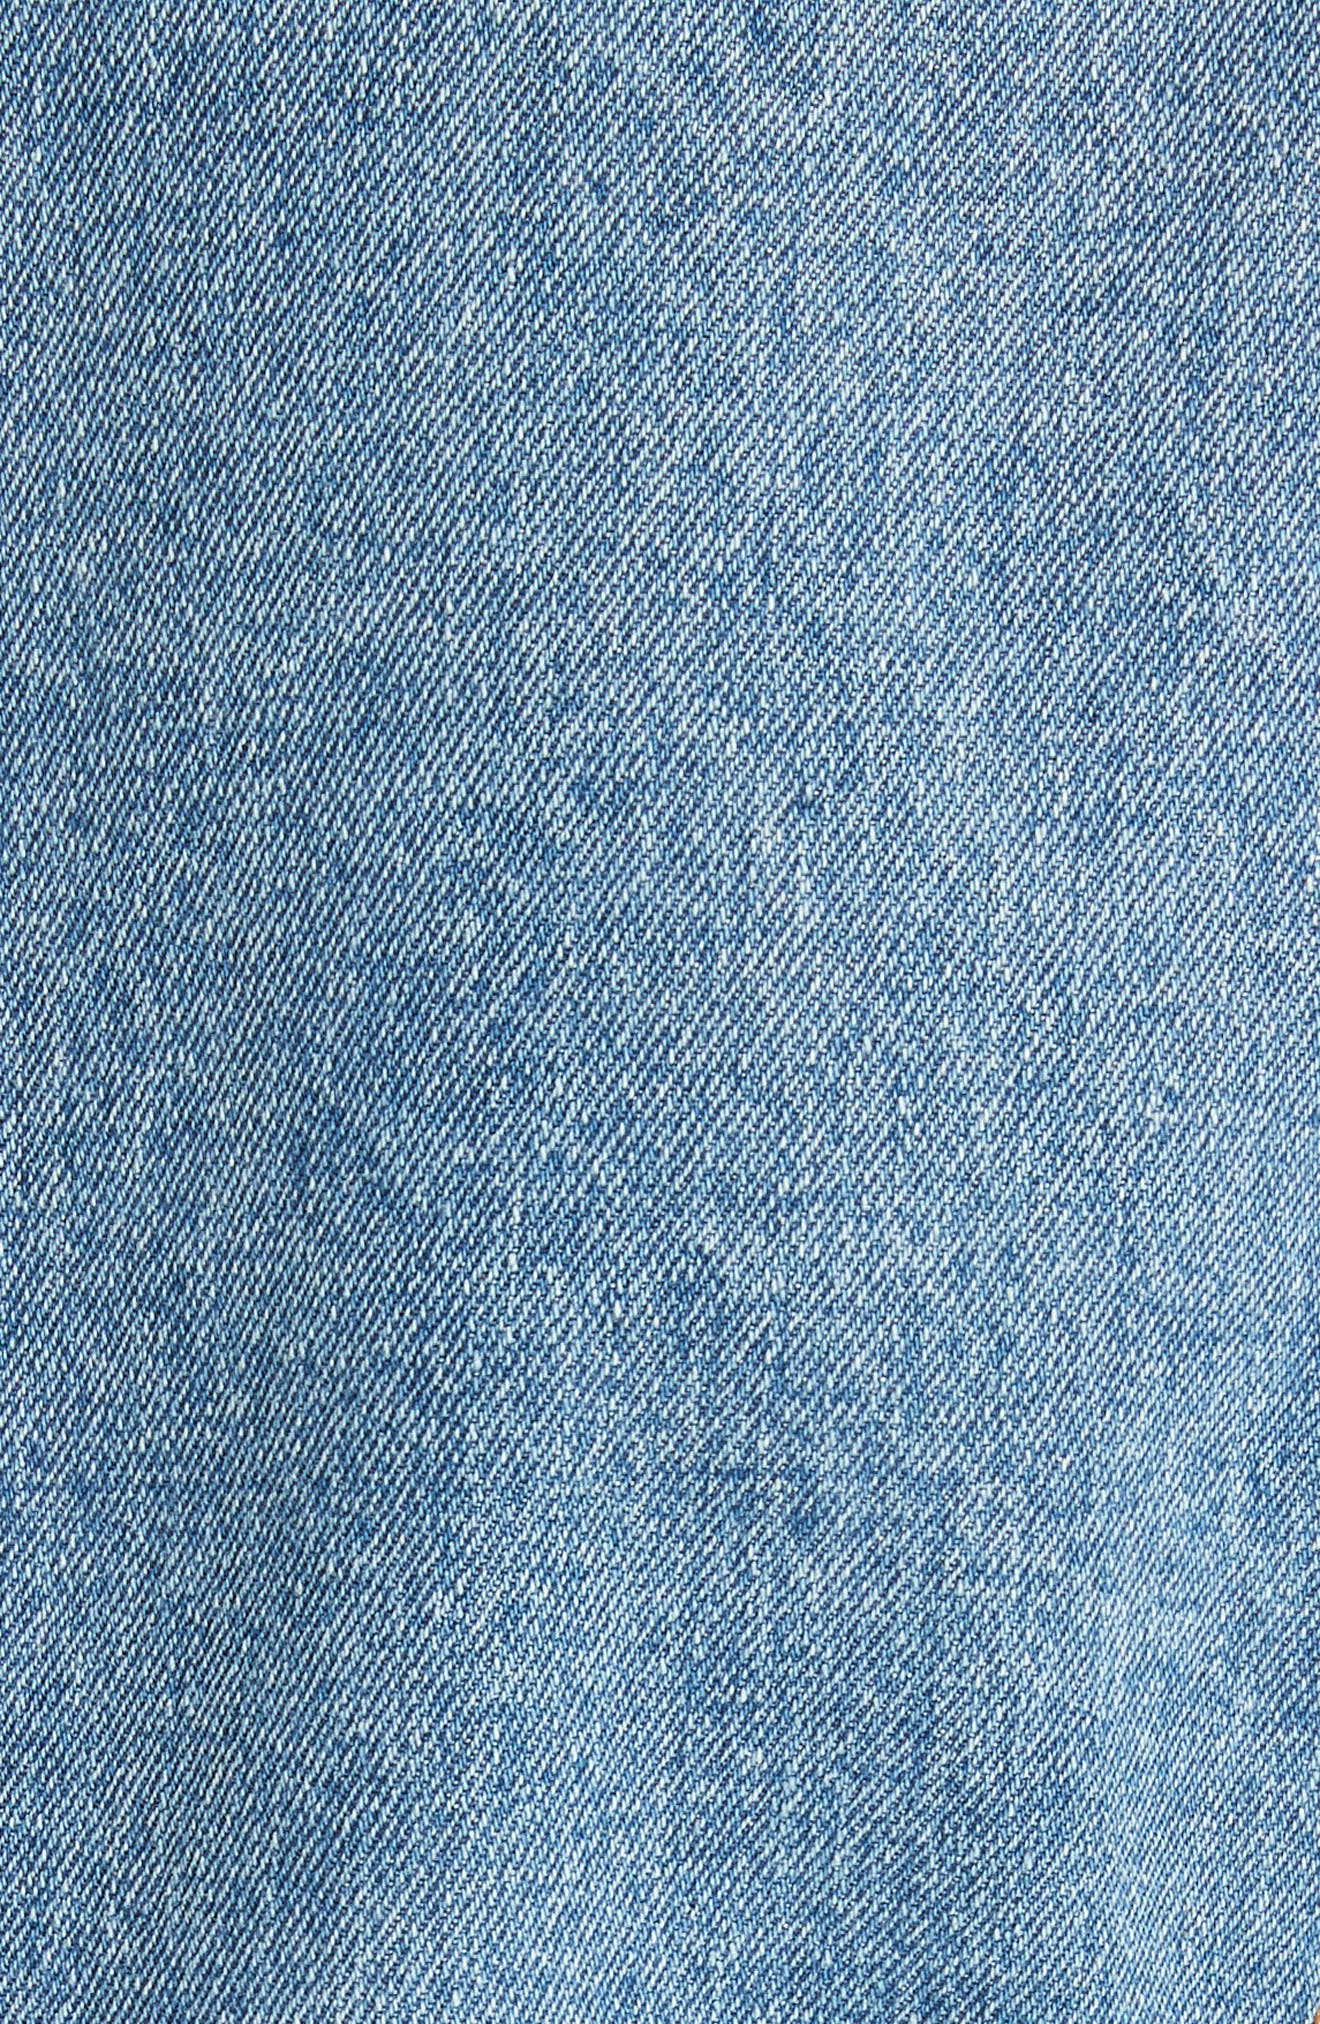 VERONICA BEARD, Caden Denim Dickey Jacket, Alternate thumbnail 7, color, MID BLUE